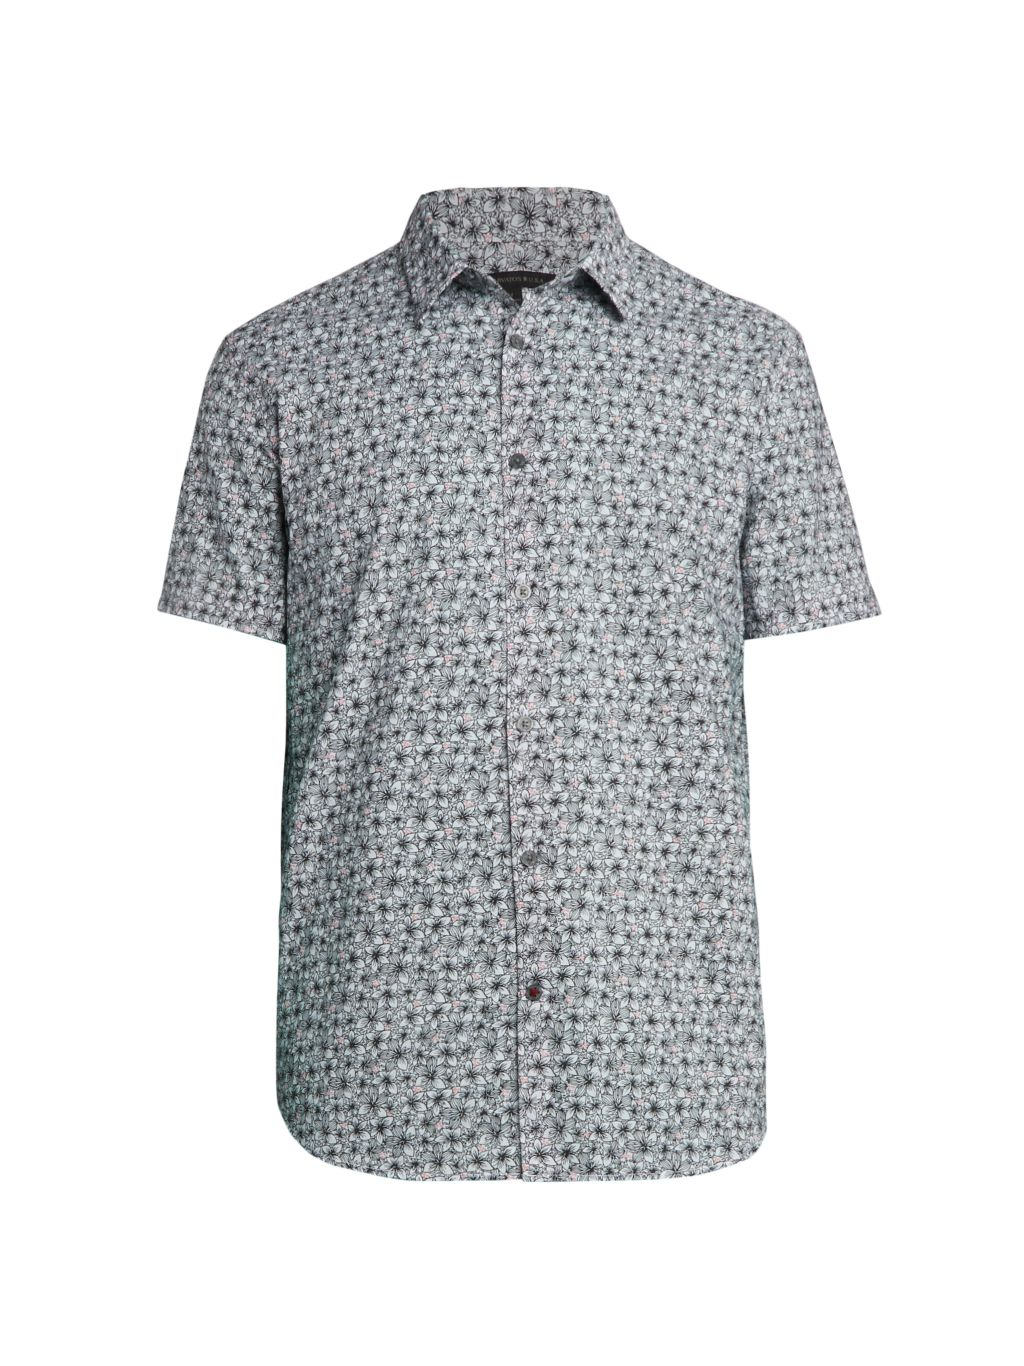 John Varvatos Star U.S.A. Floral Short-Sleeve Shirt